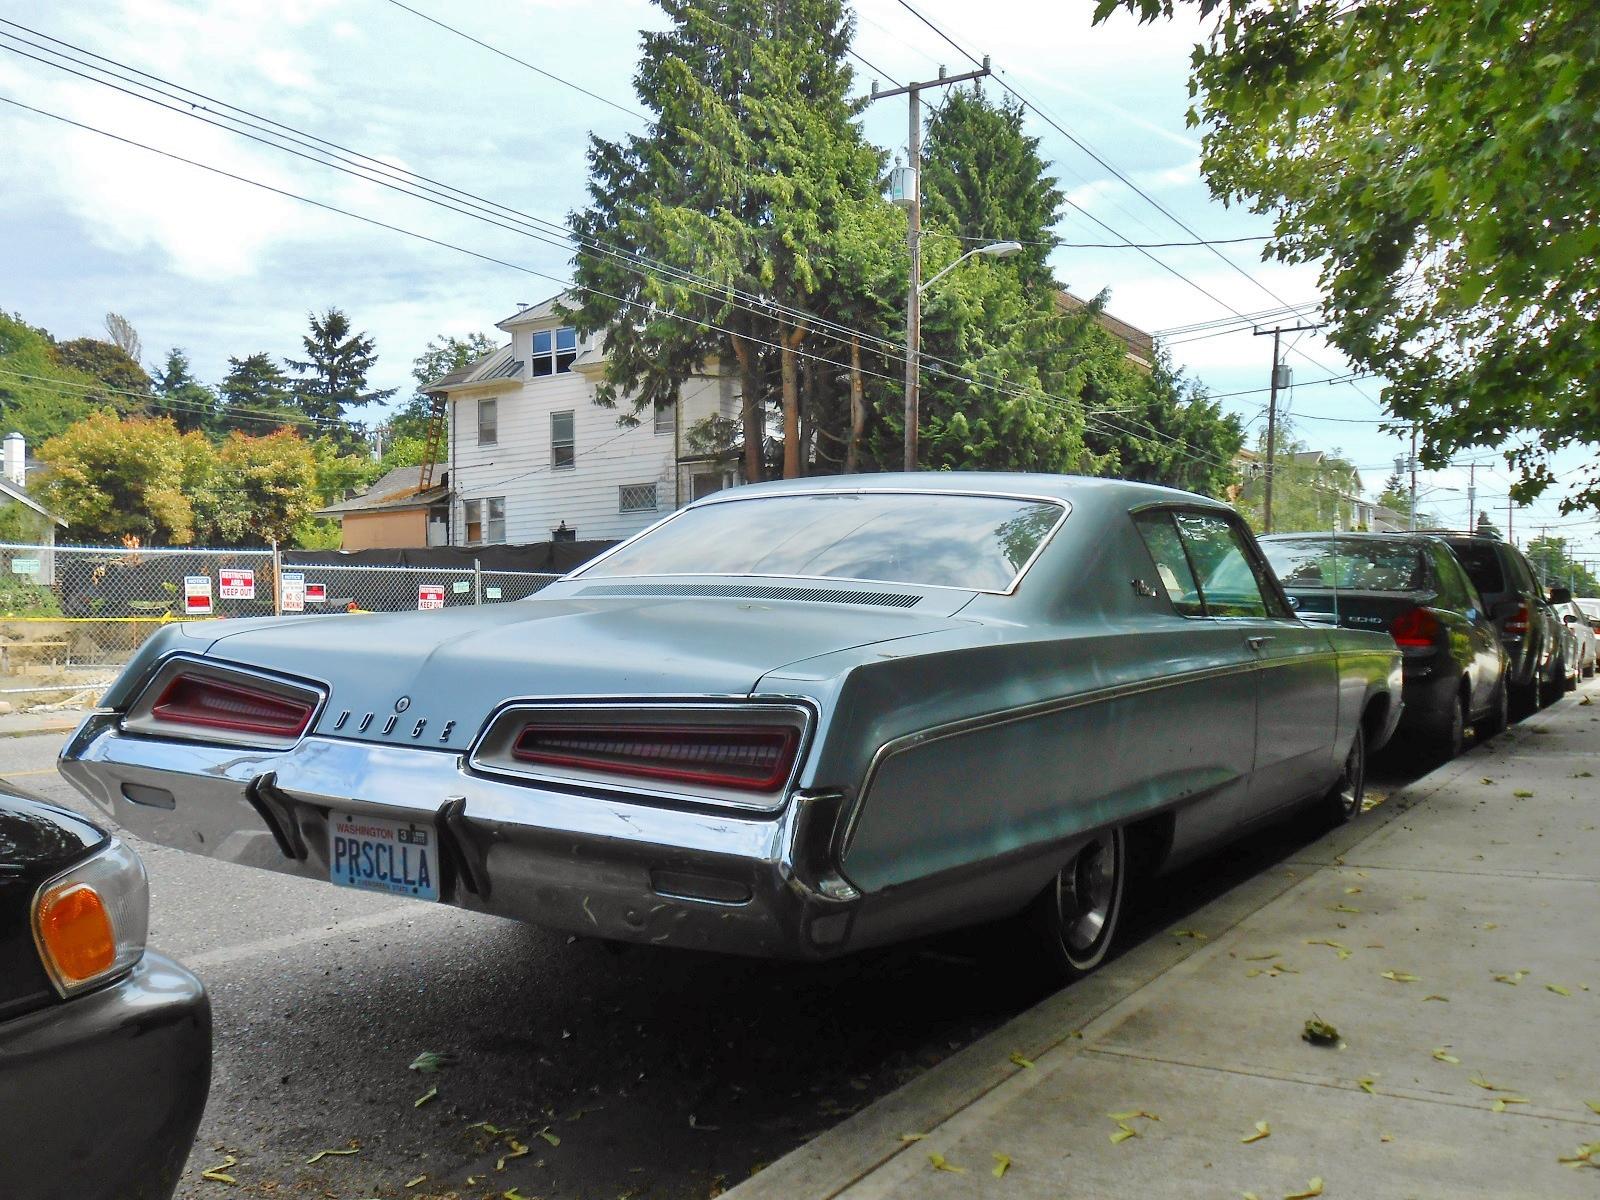 Kia Cherry Hill >> Cherry Hill Dodge Chrysler Jeep Ram In Cherry Hill Nj | Autos Post